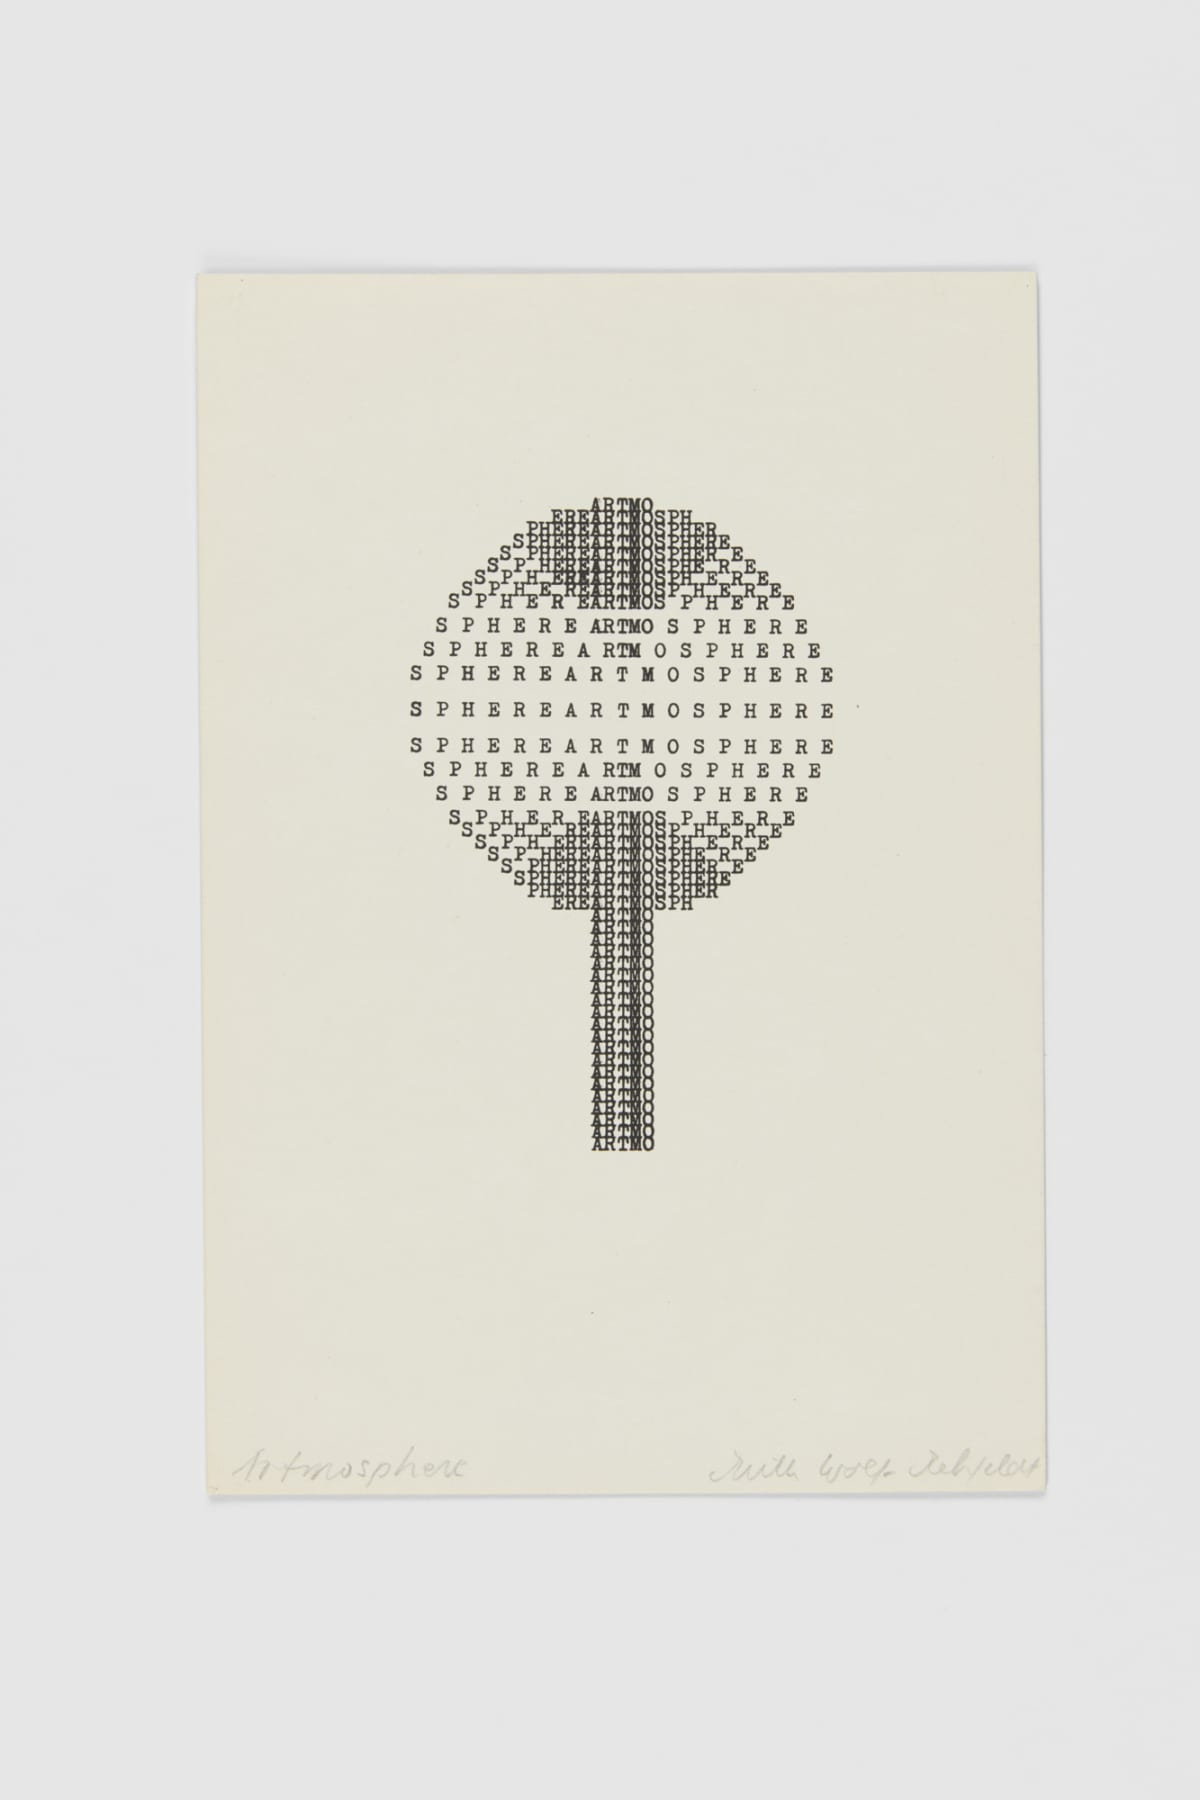 Ruth WOLF-REHFELDT Artmosphere, 1980 print (zinc lithograph) 21.6 x 14.9 cm